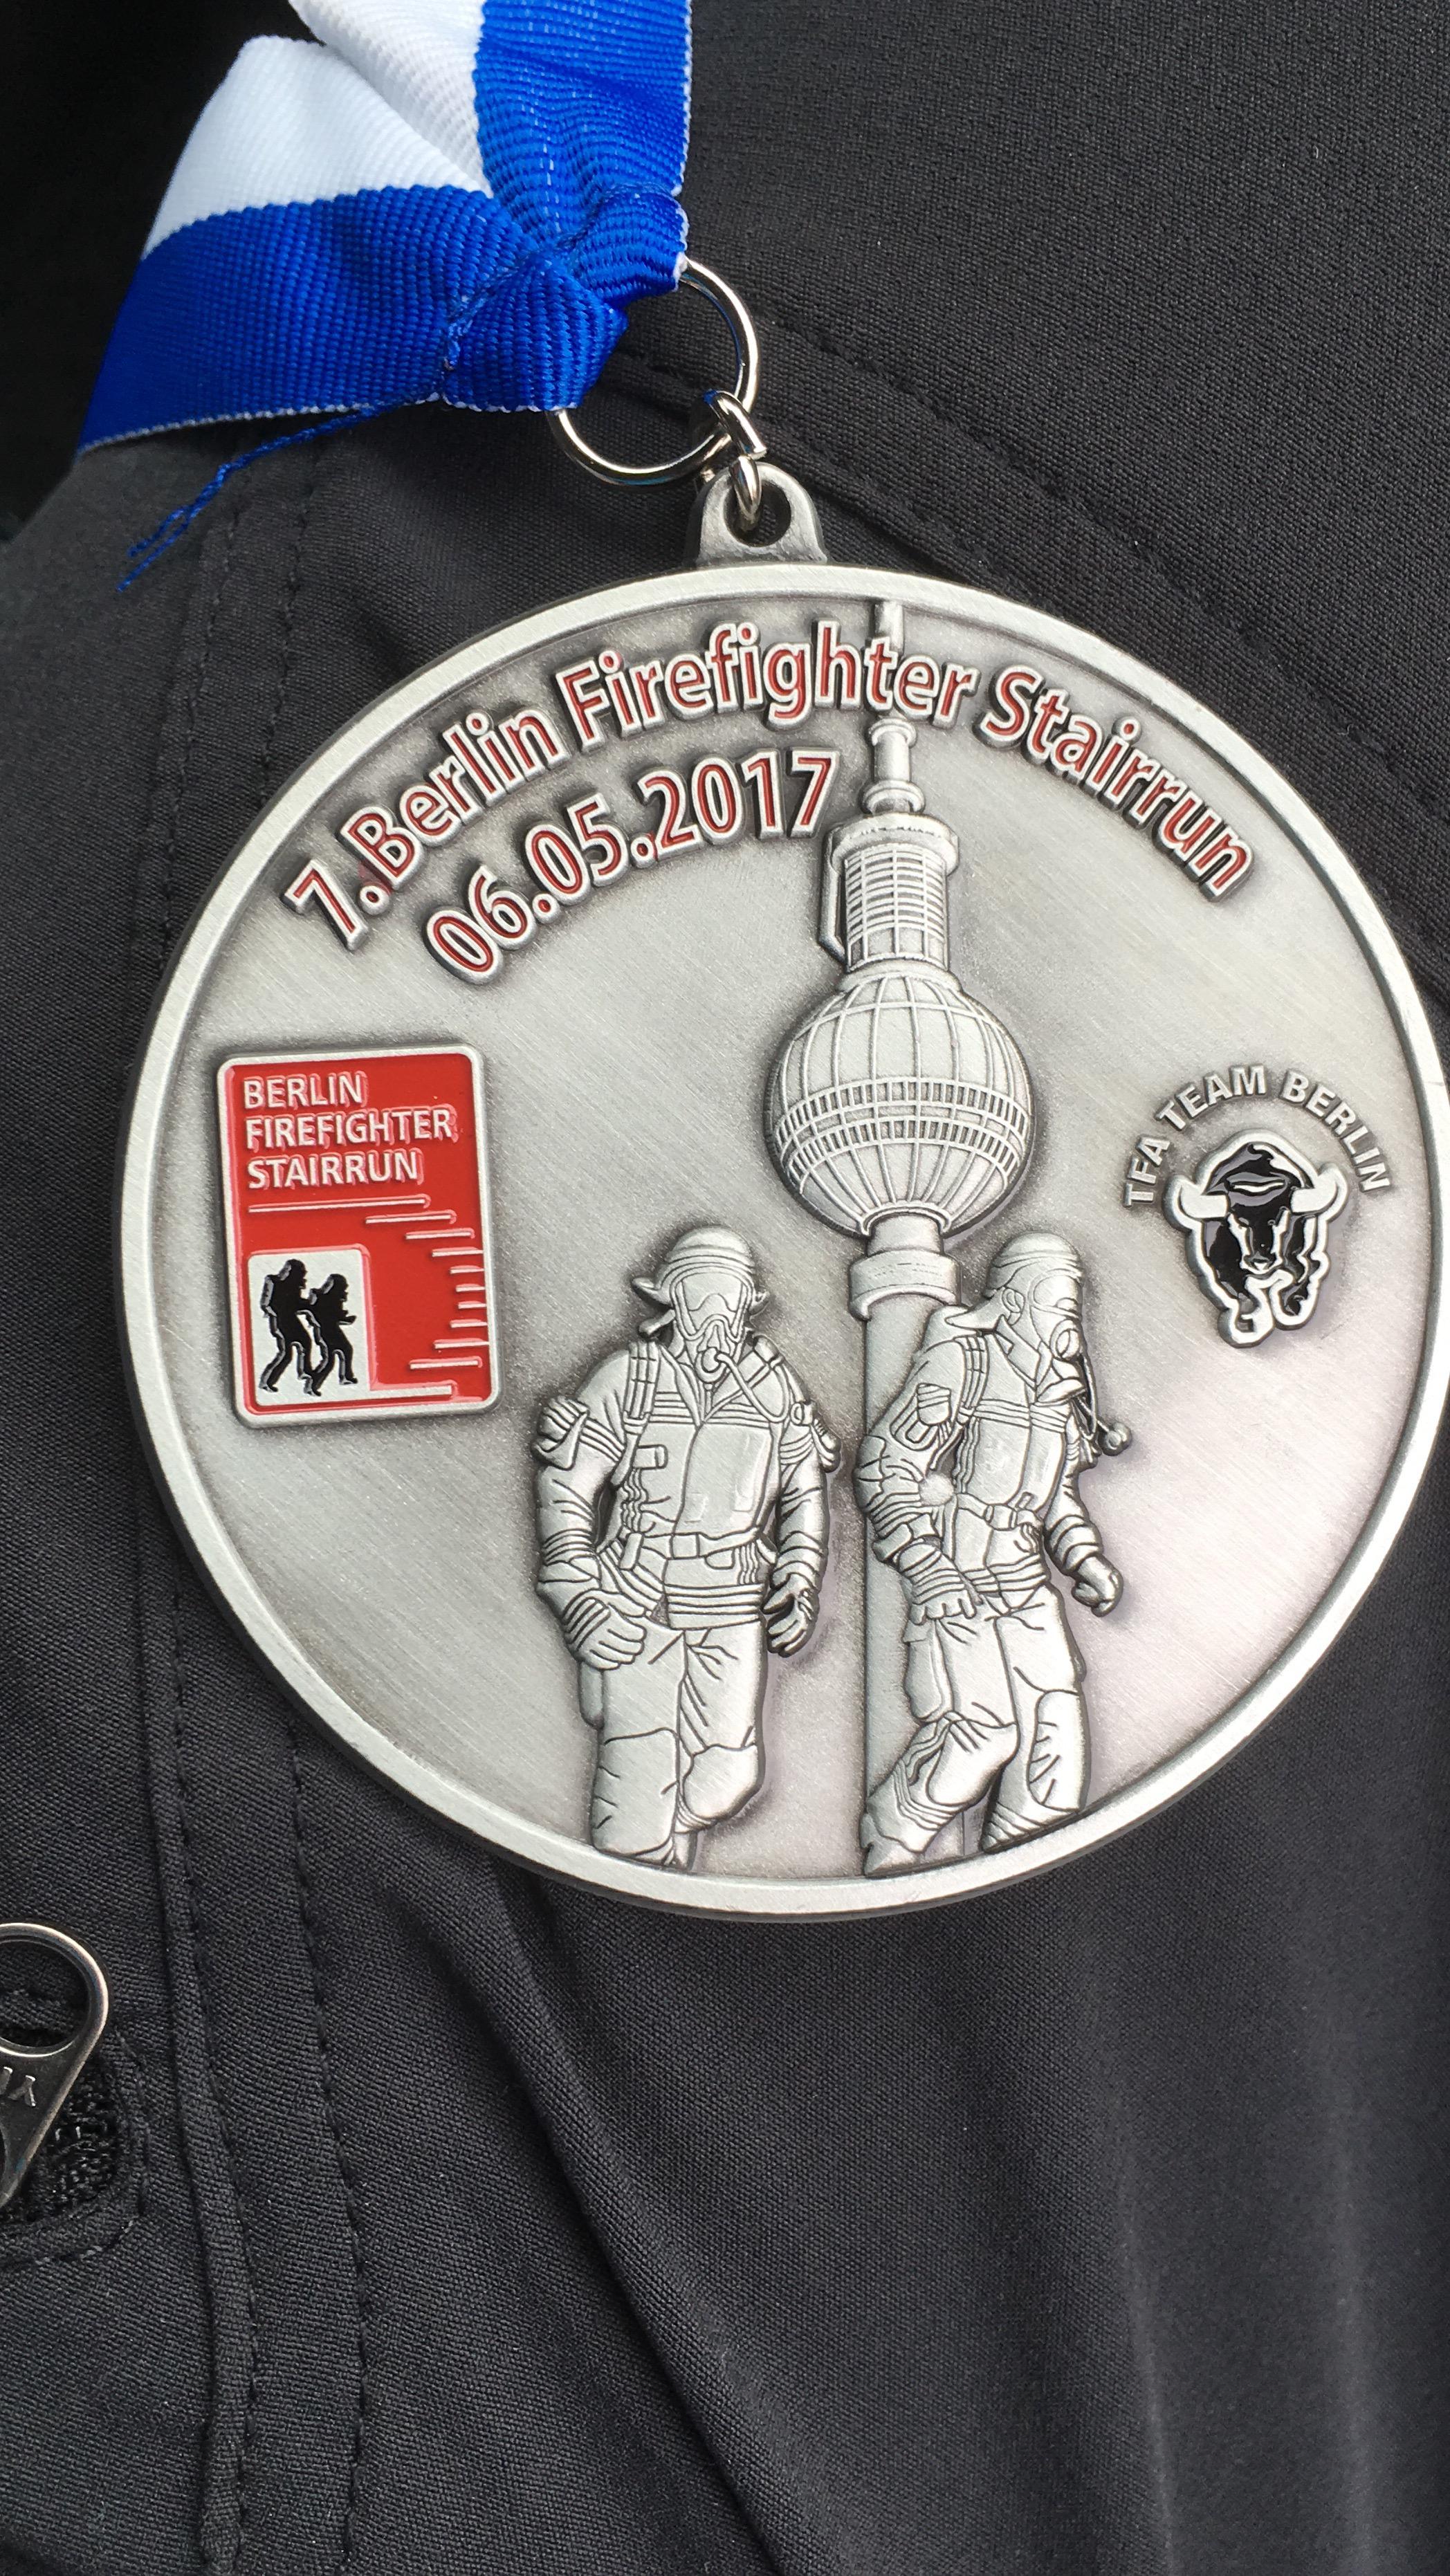 Firefighter-Stairrun-03_Teilnehmermedaille